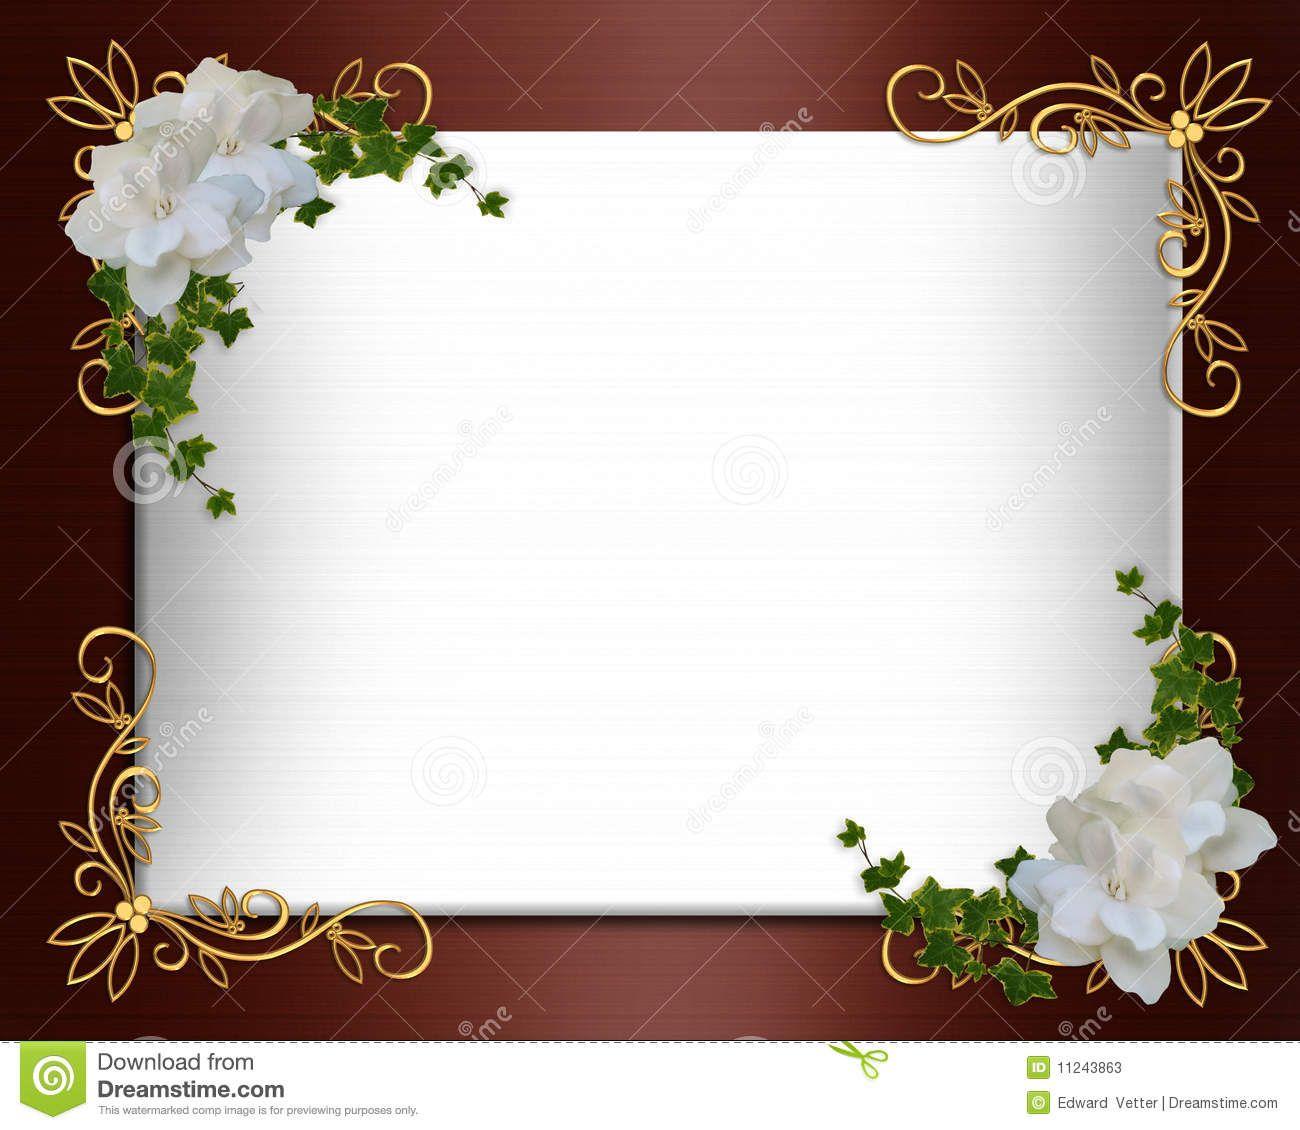 blank elegant wedding invitation designs Google Search